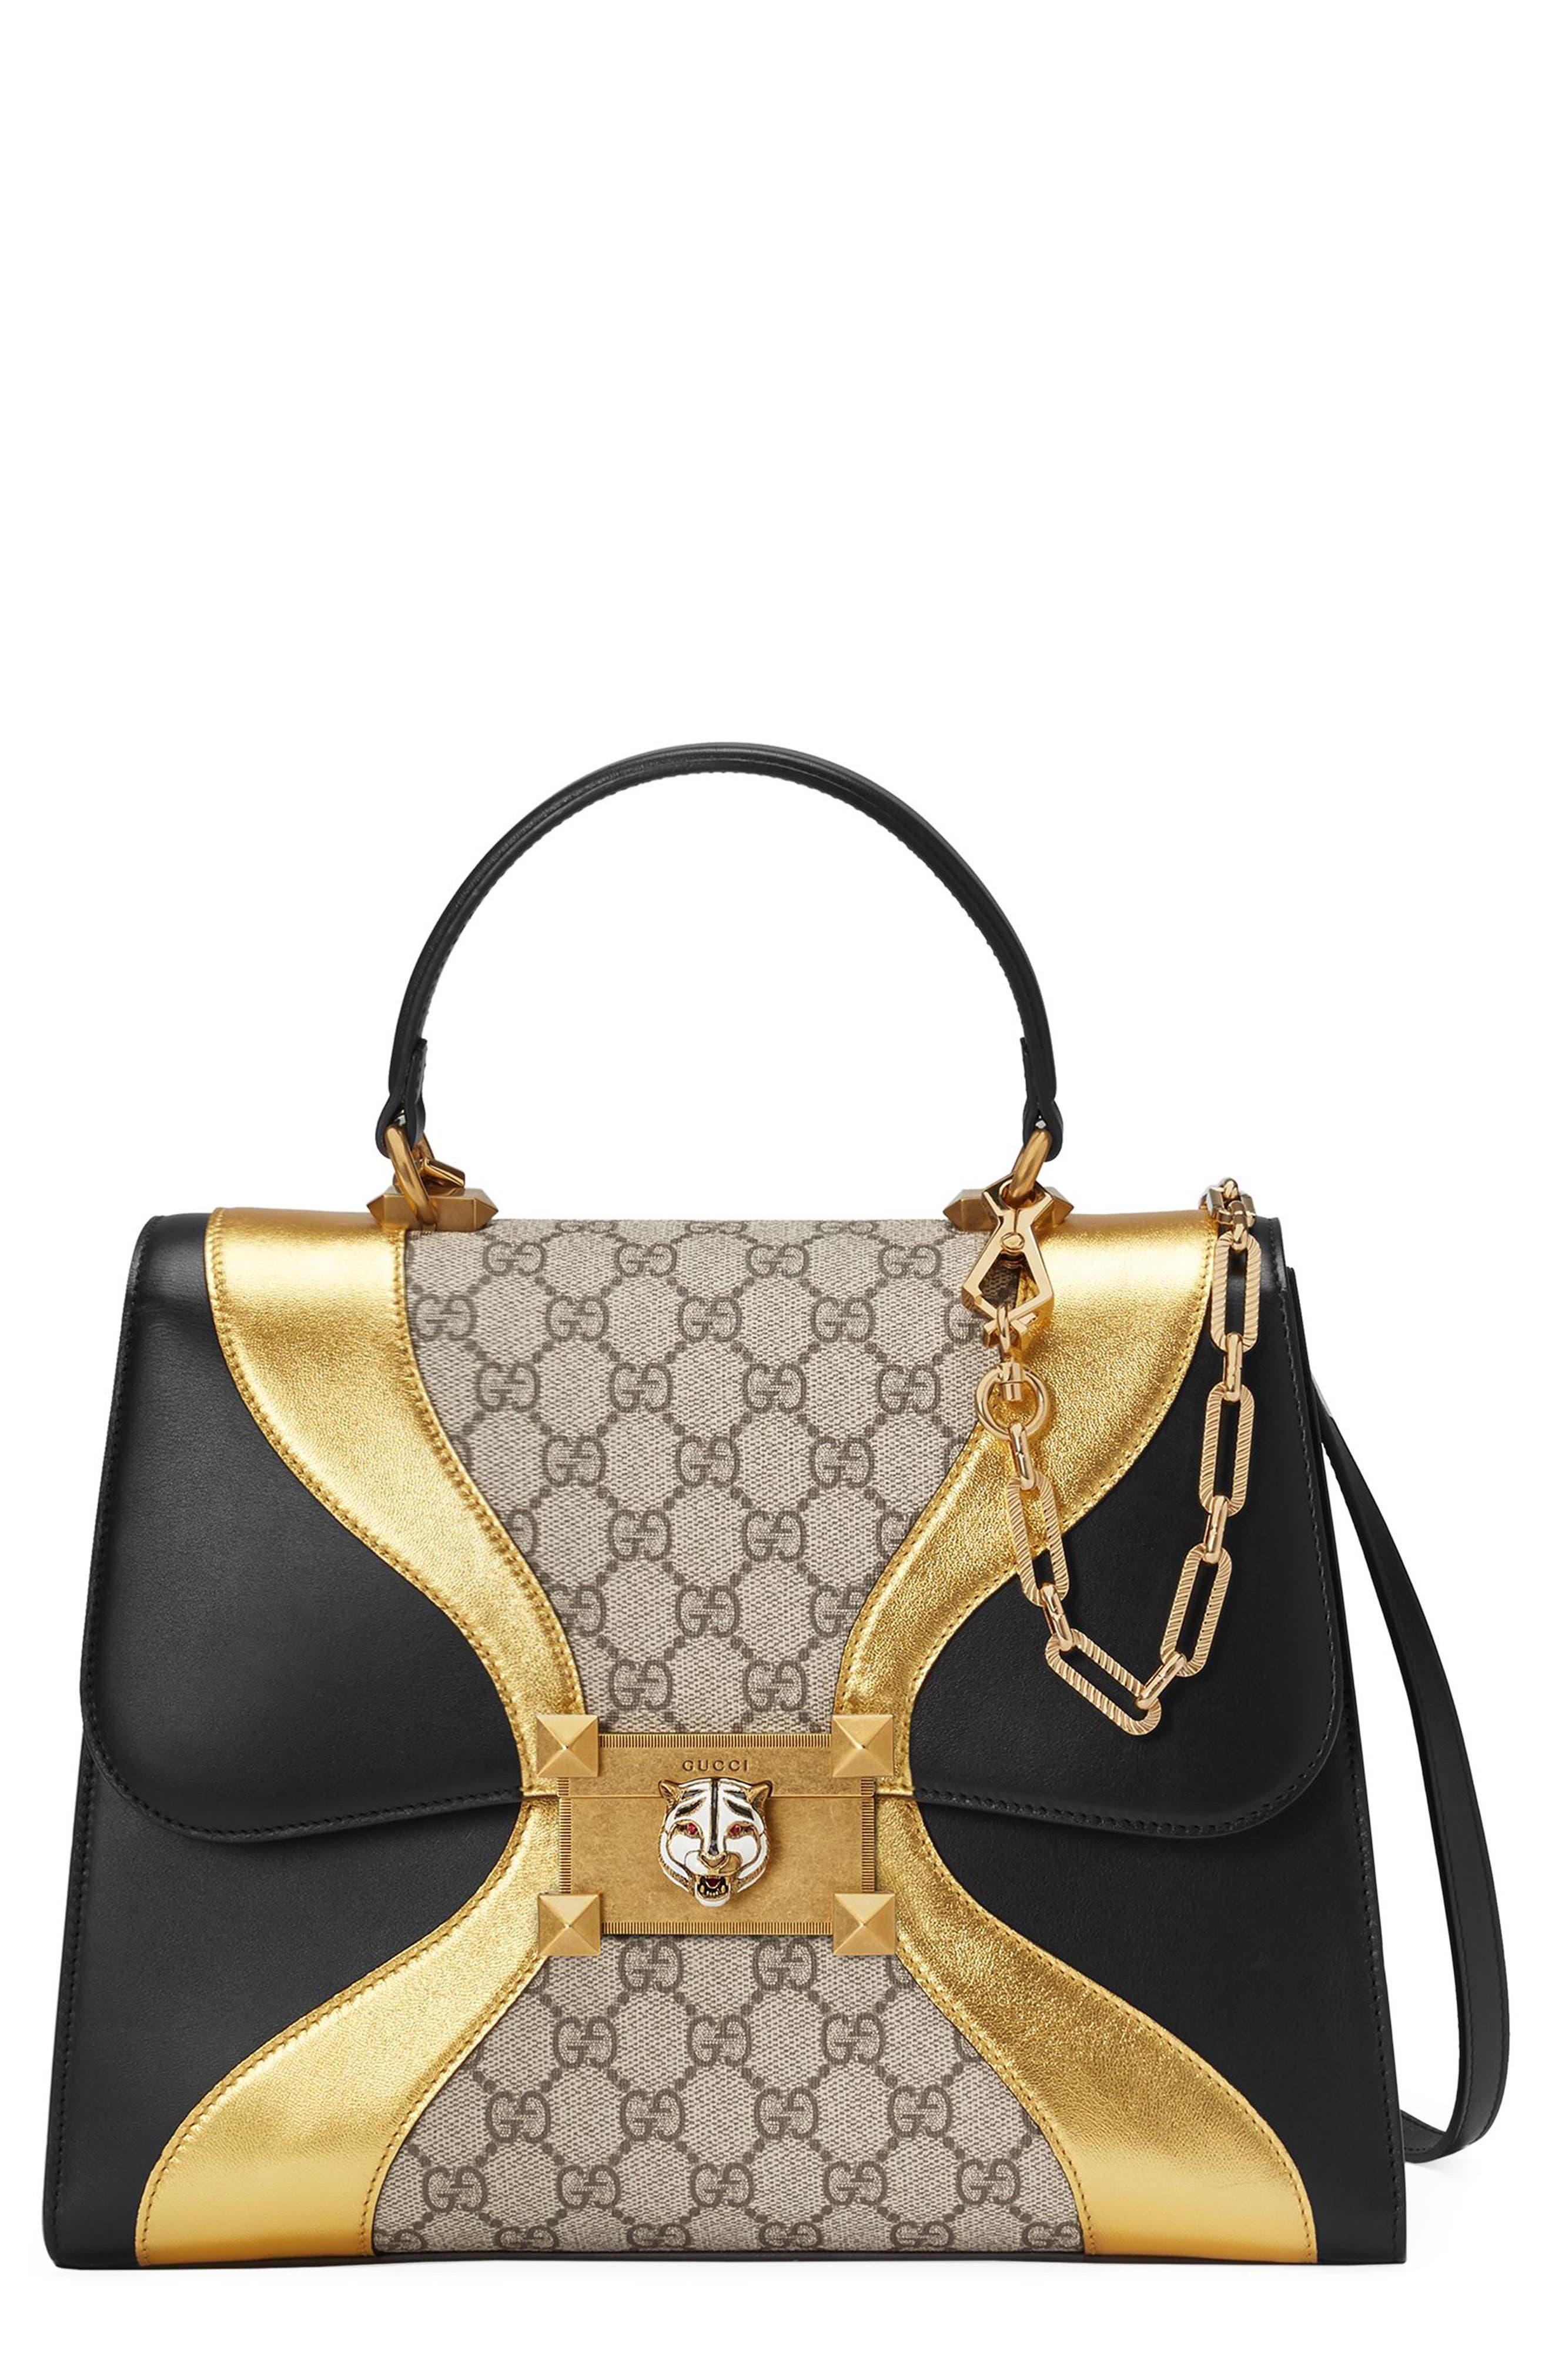 Alternate Image 1 Selected - Gucci Osiride Top Handle GG Supreme & Leather Satchel